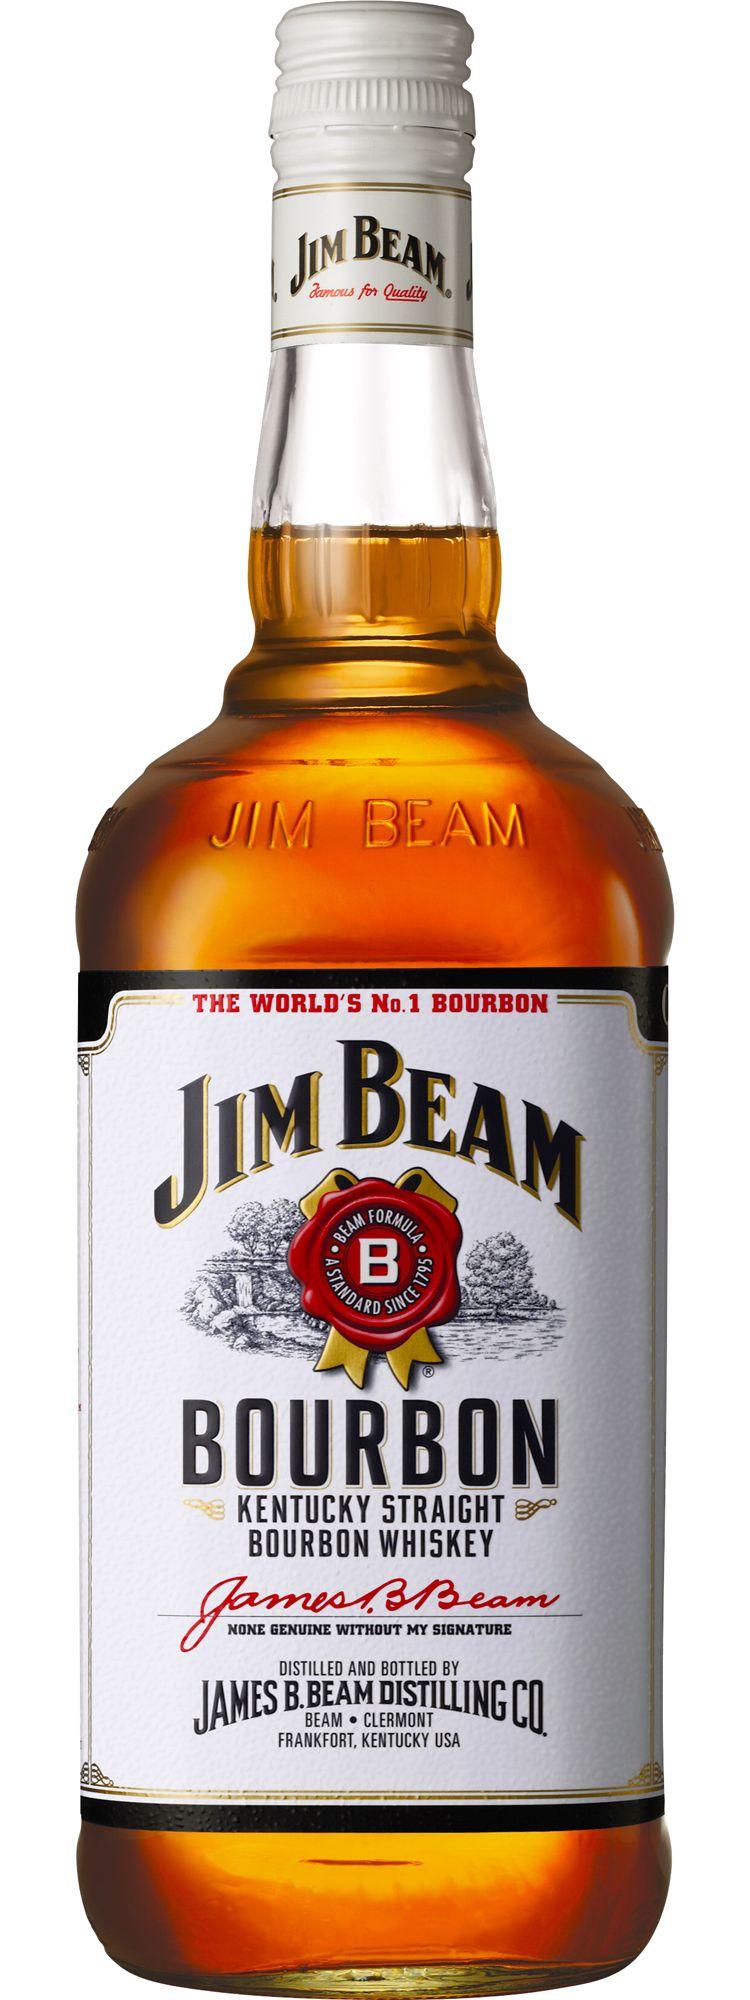 Jim Beam White Label Bourbon Bourbon whiskey, Bourbon